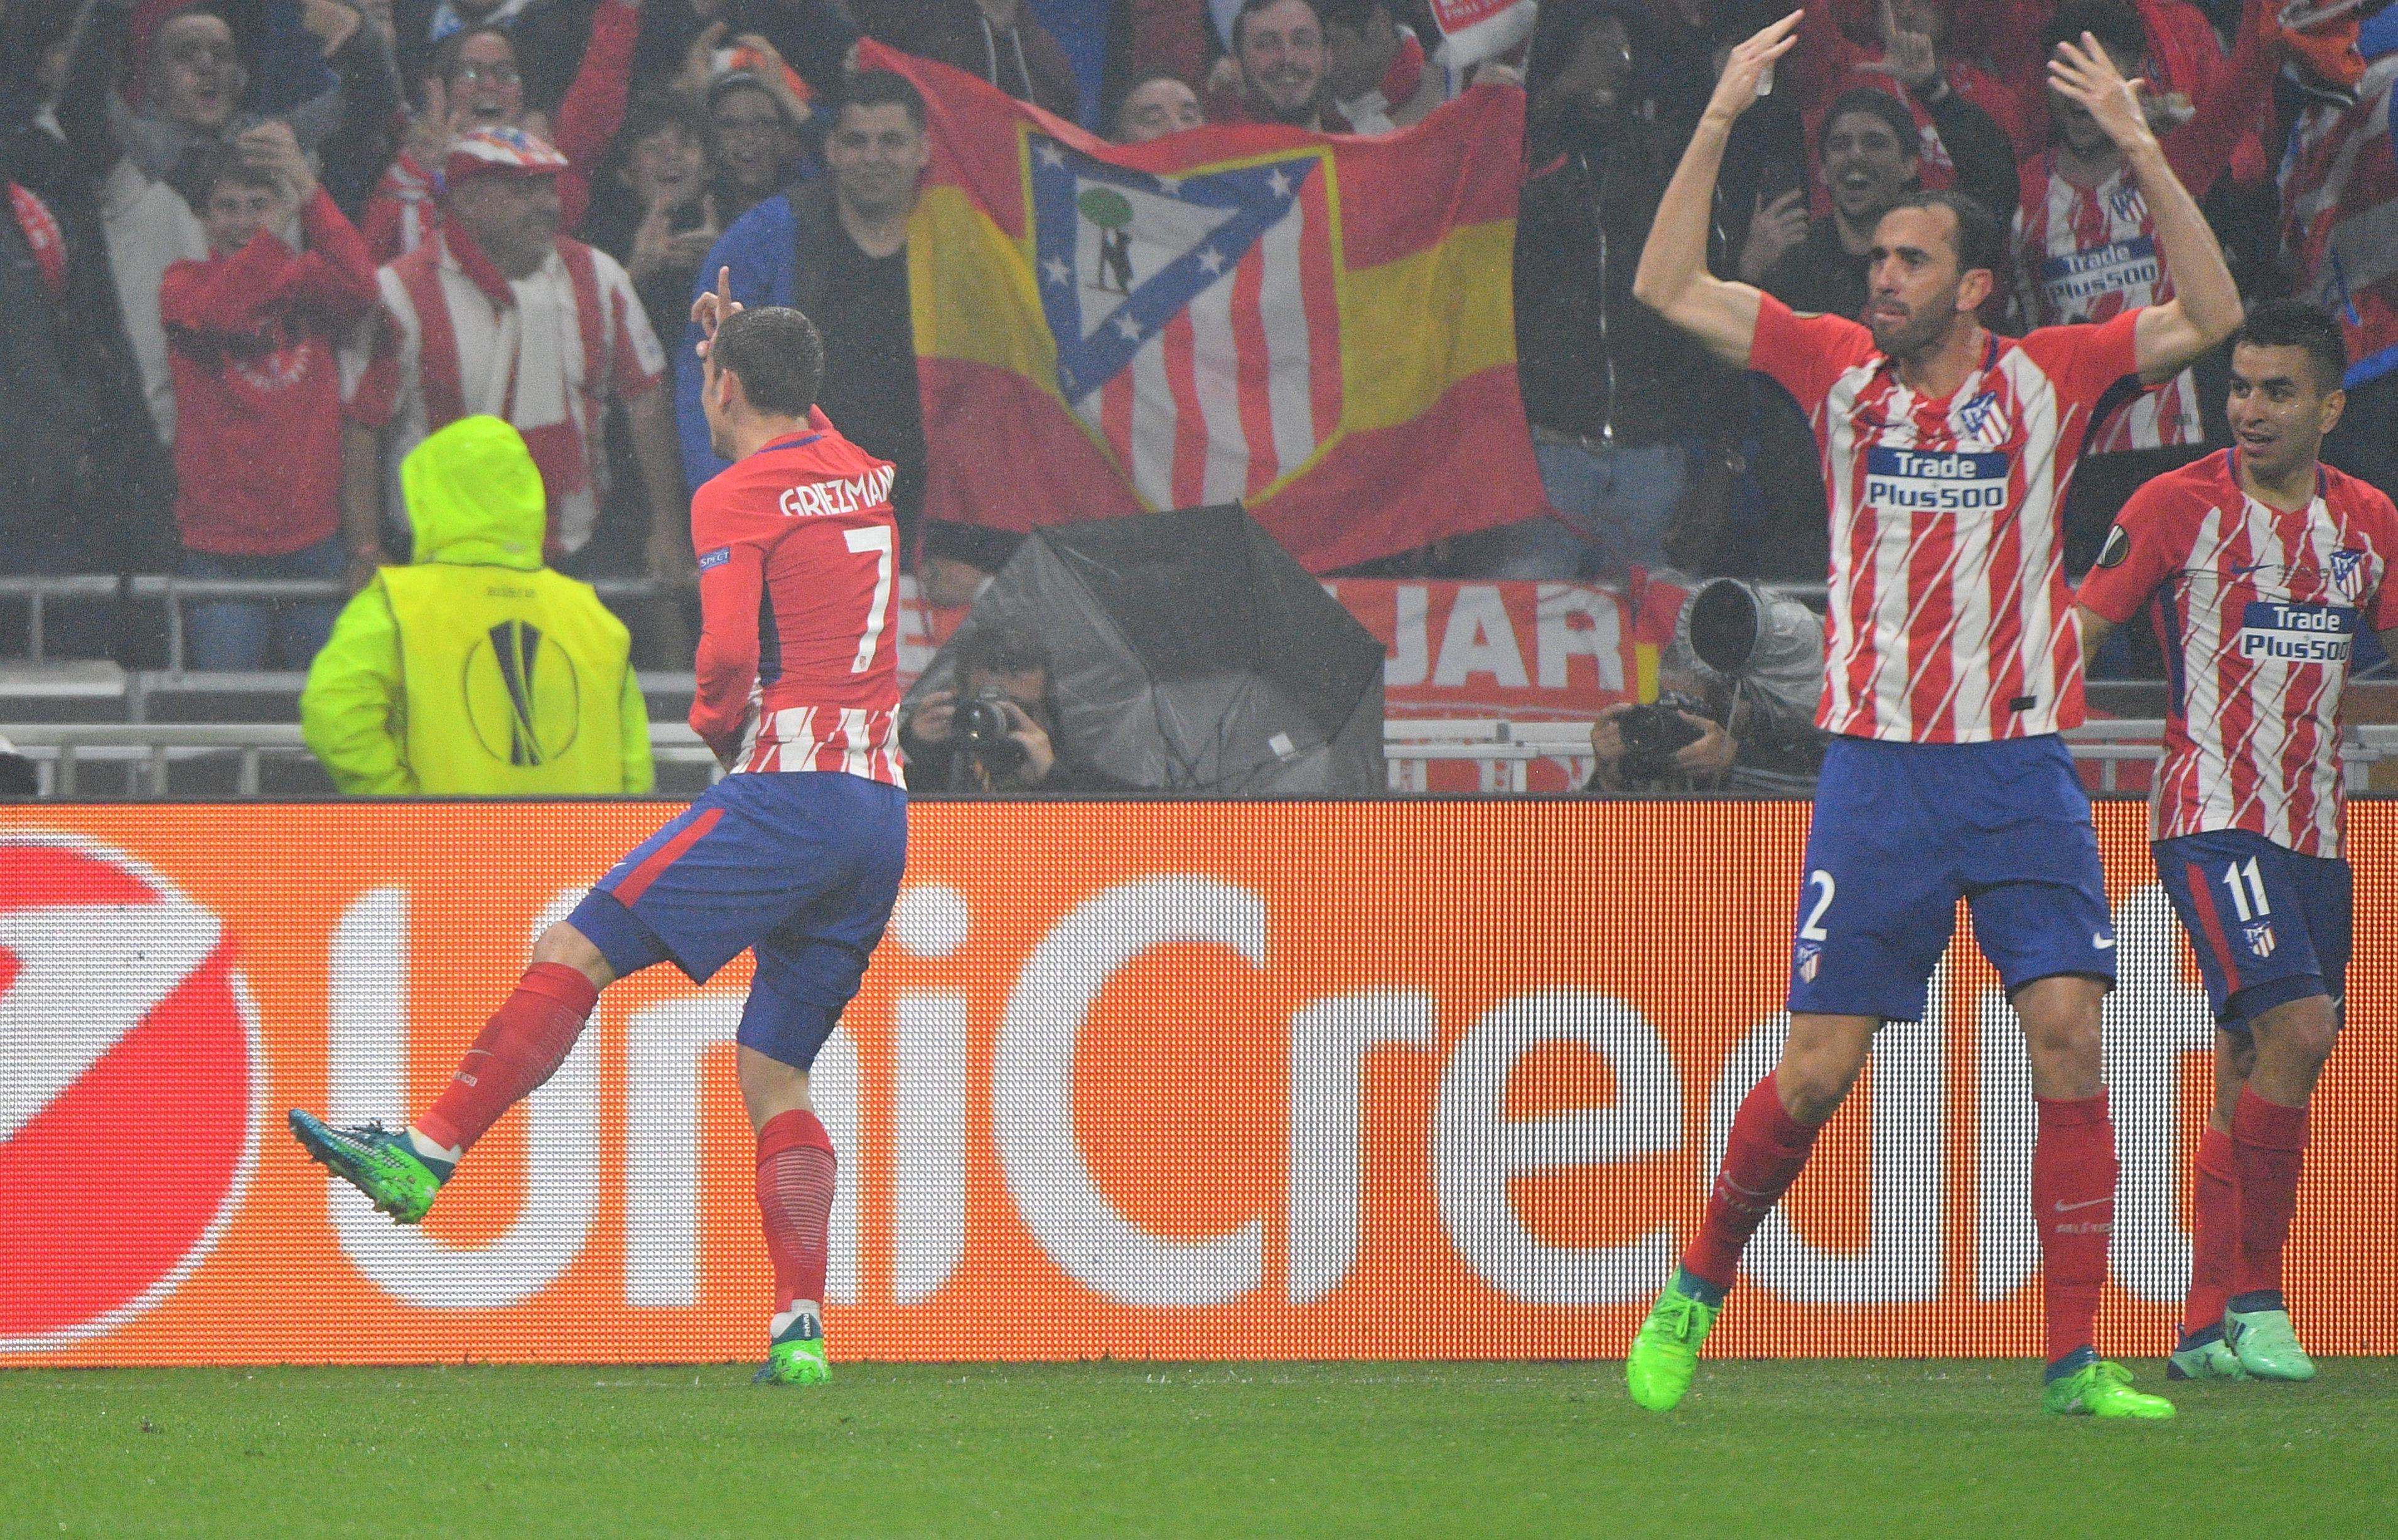 Griezmann celebrates scoring a goal. Image: PA